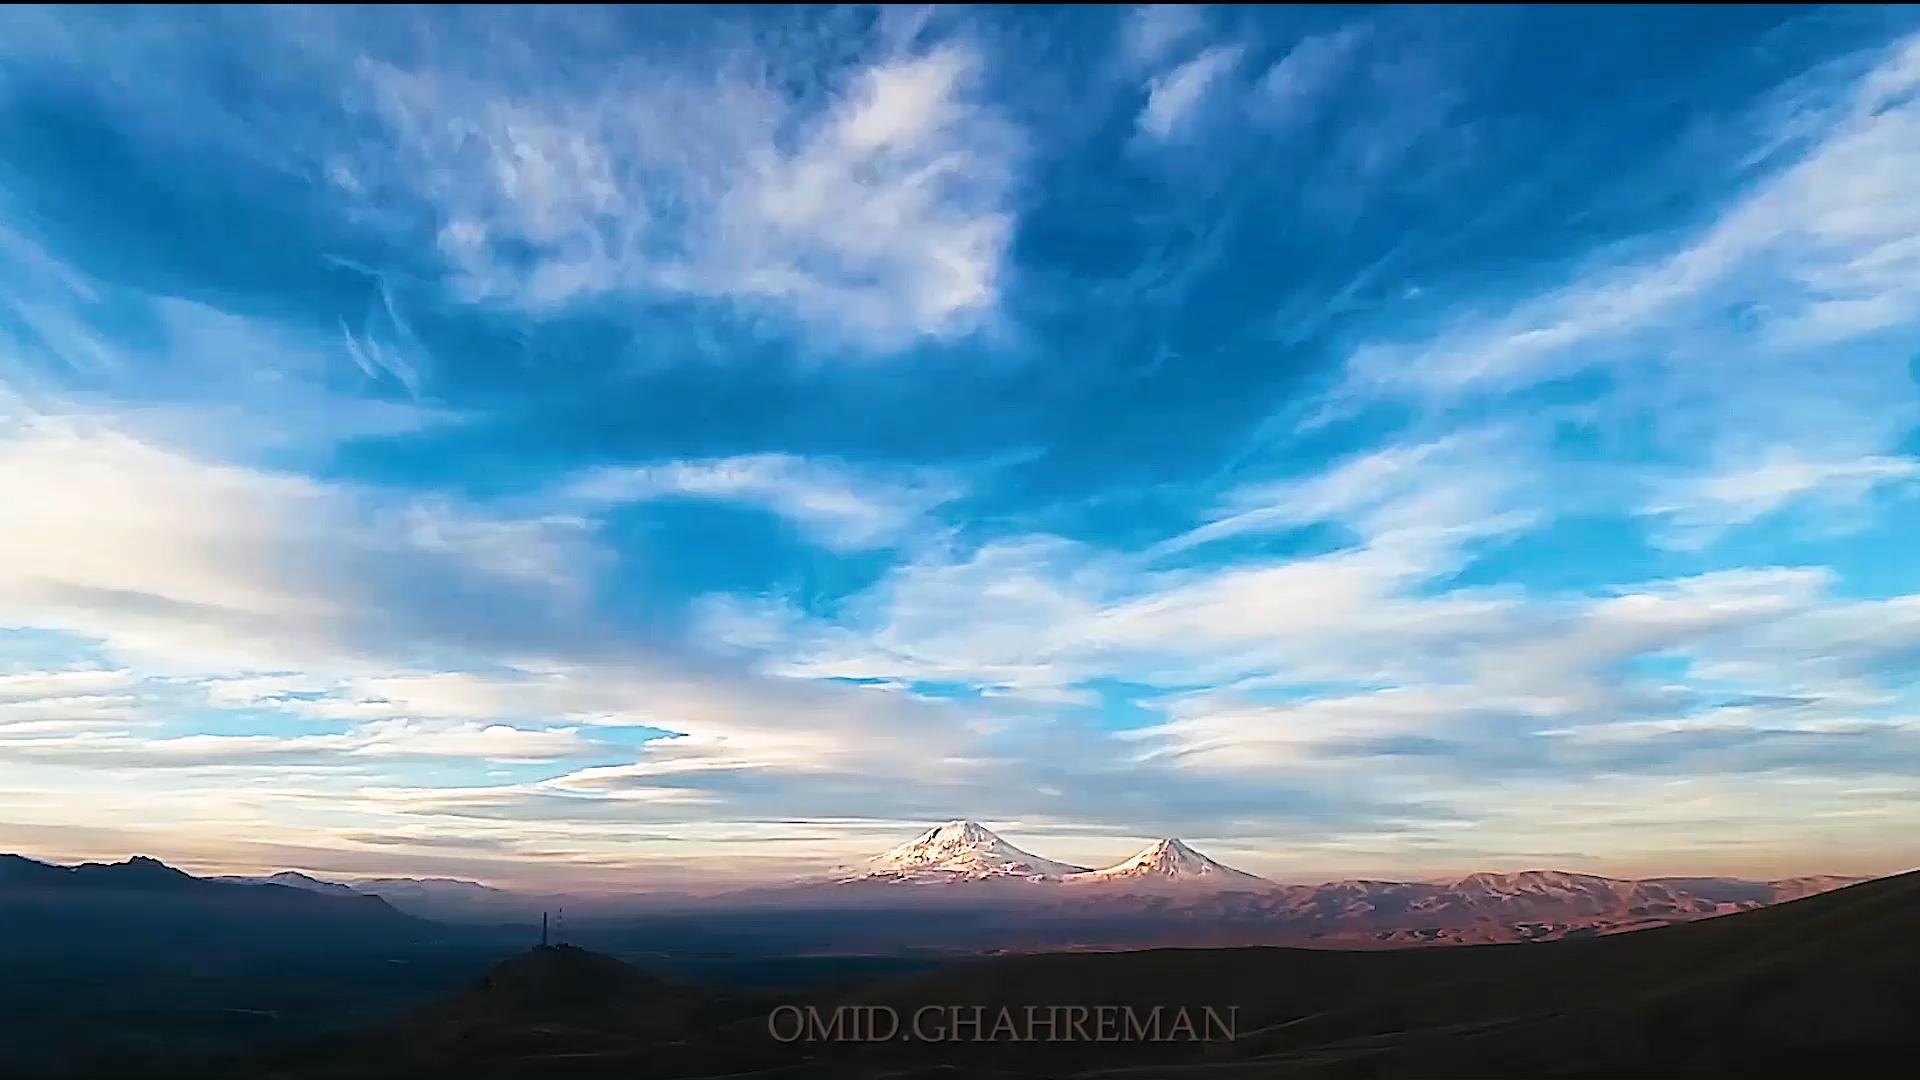 Ararat mountain time lapse video from maku   Omid Ghahreman ویدئو گذر زمان کوه آرارات از ماکو امید قهرمان